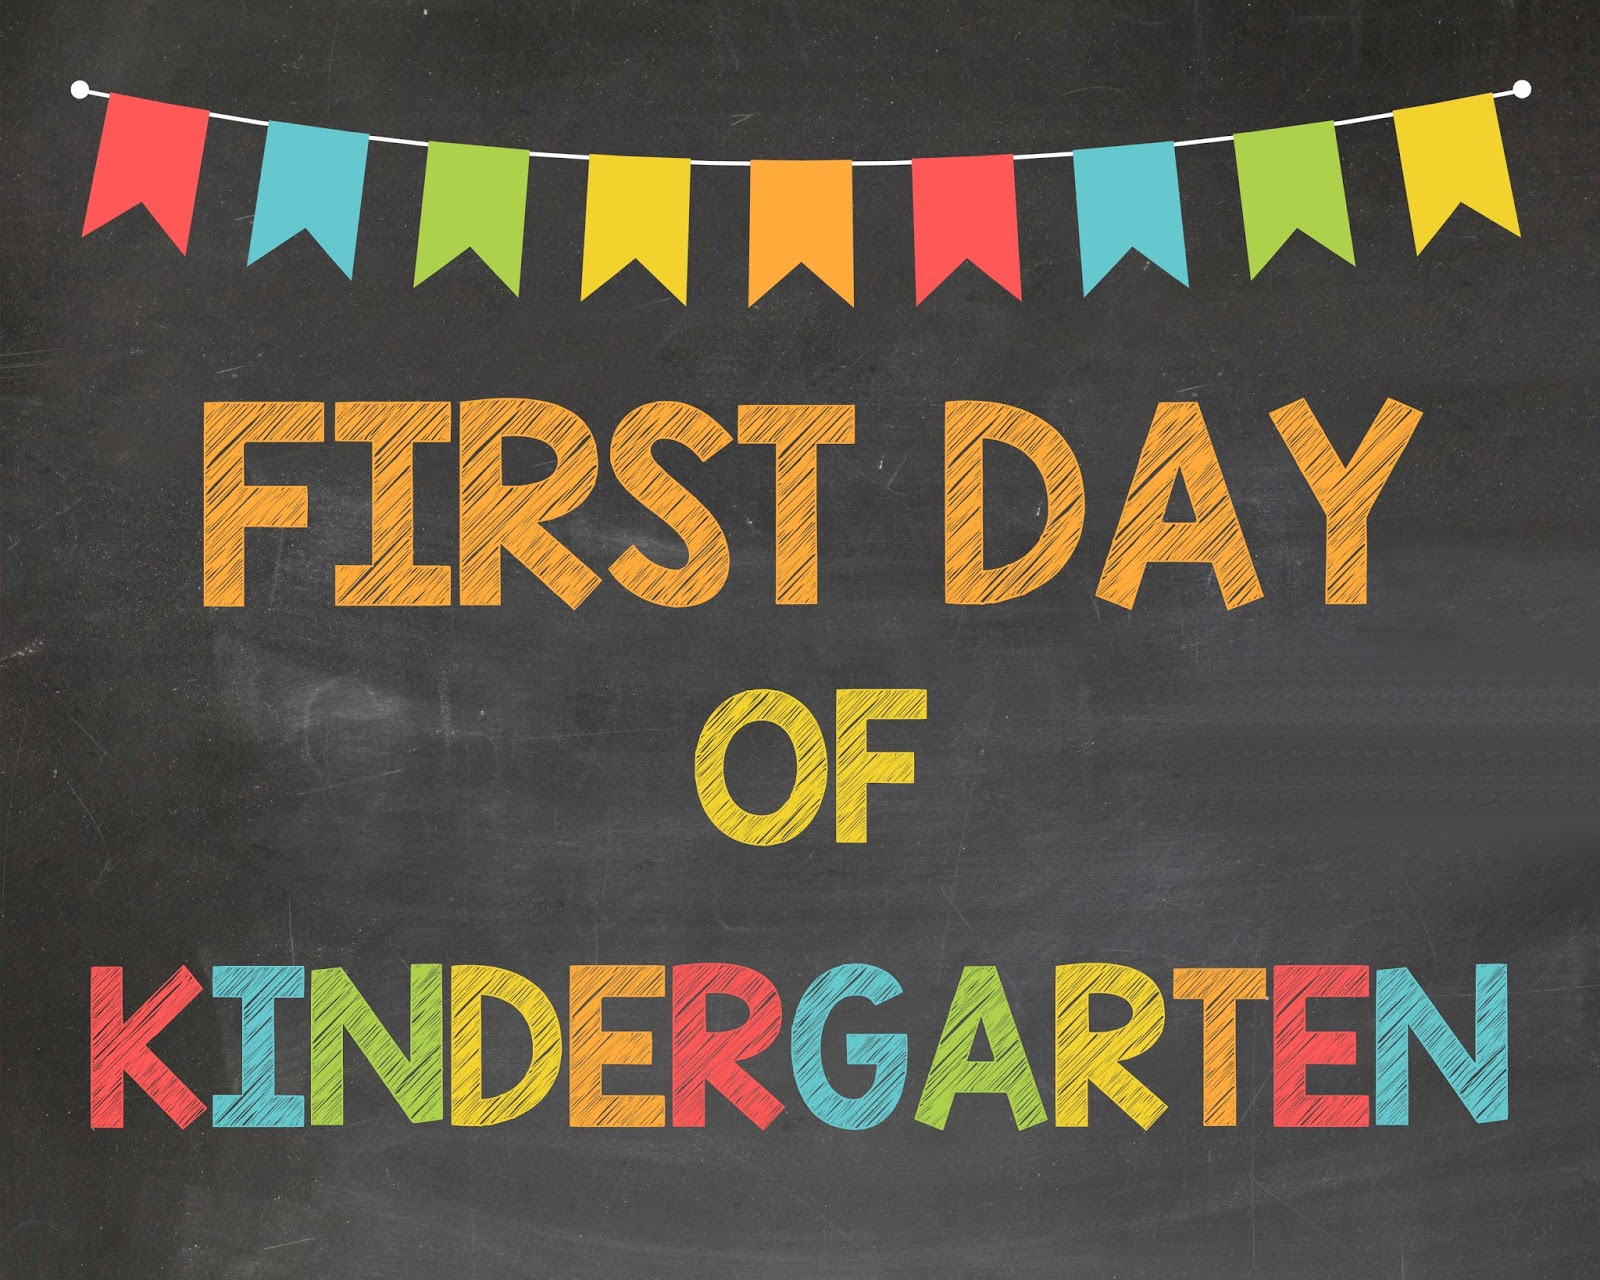 Mommy S Nervous About Kindergarten Too